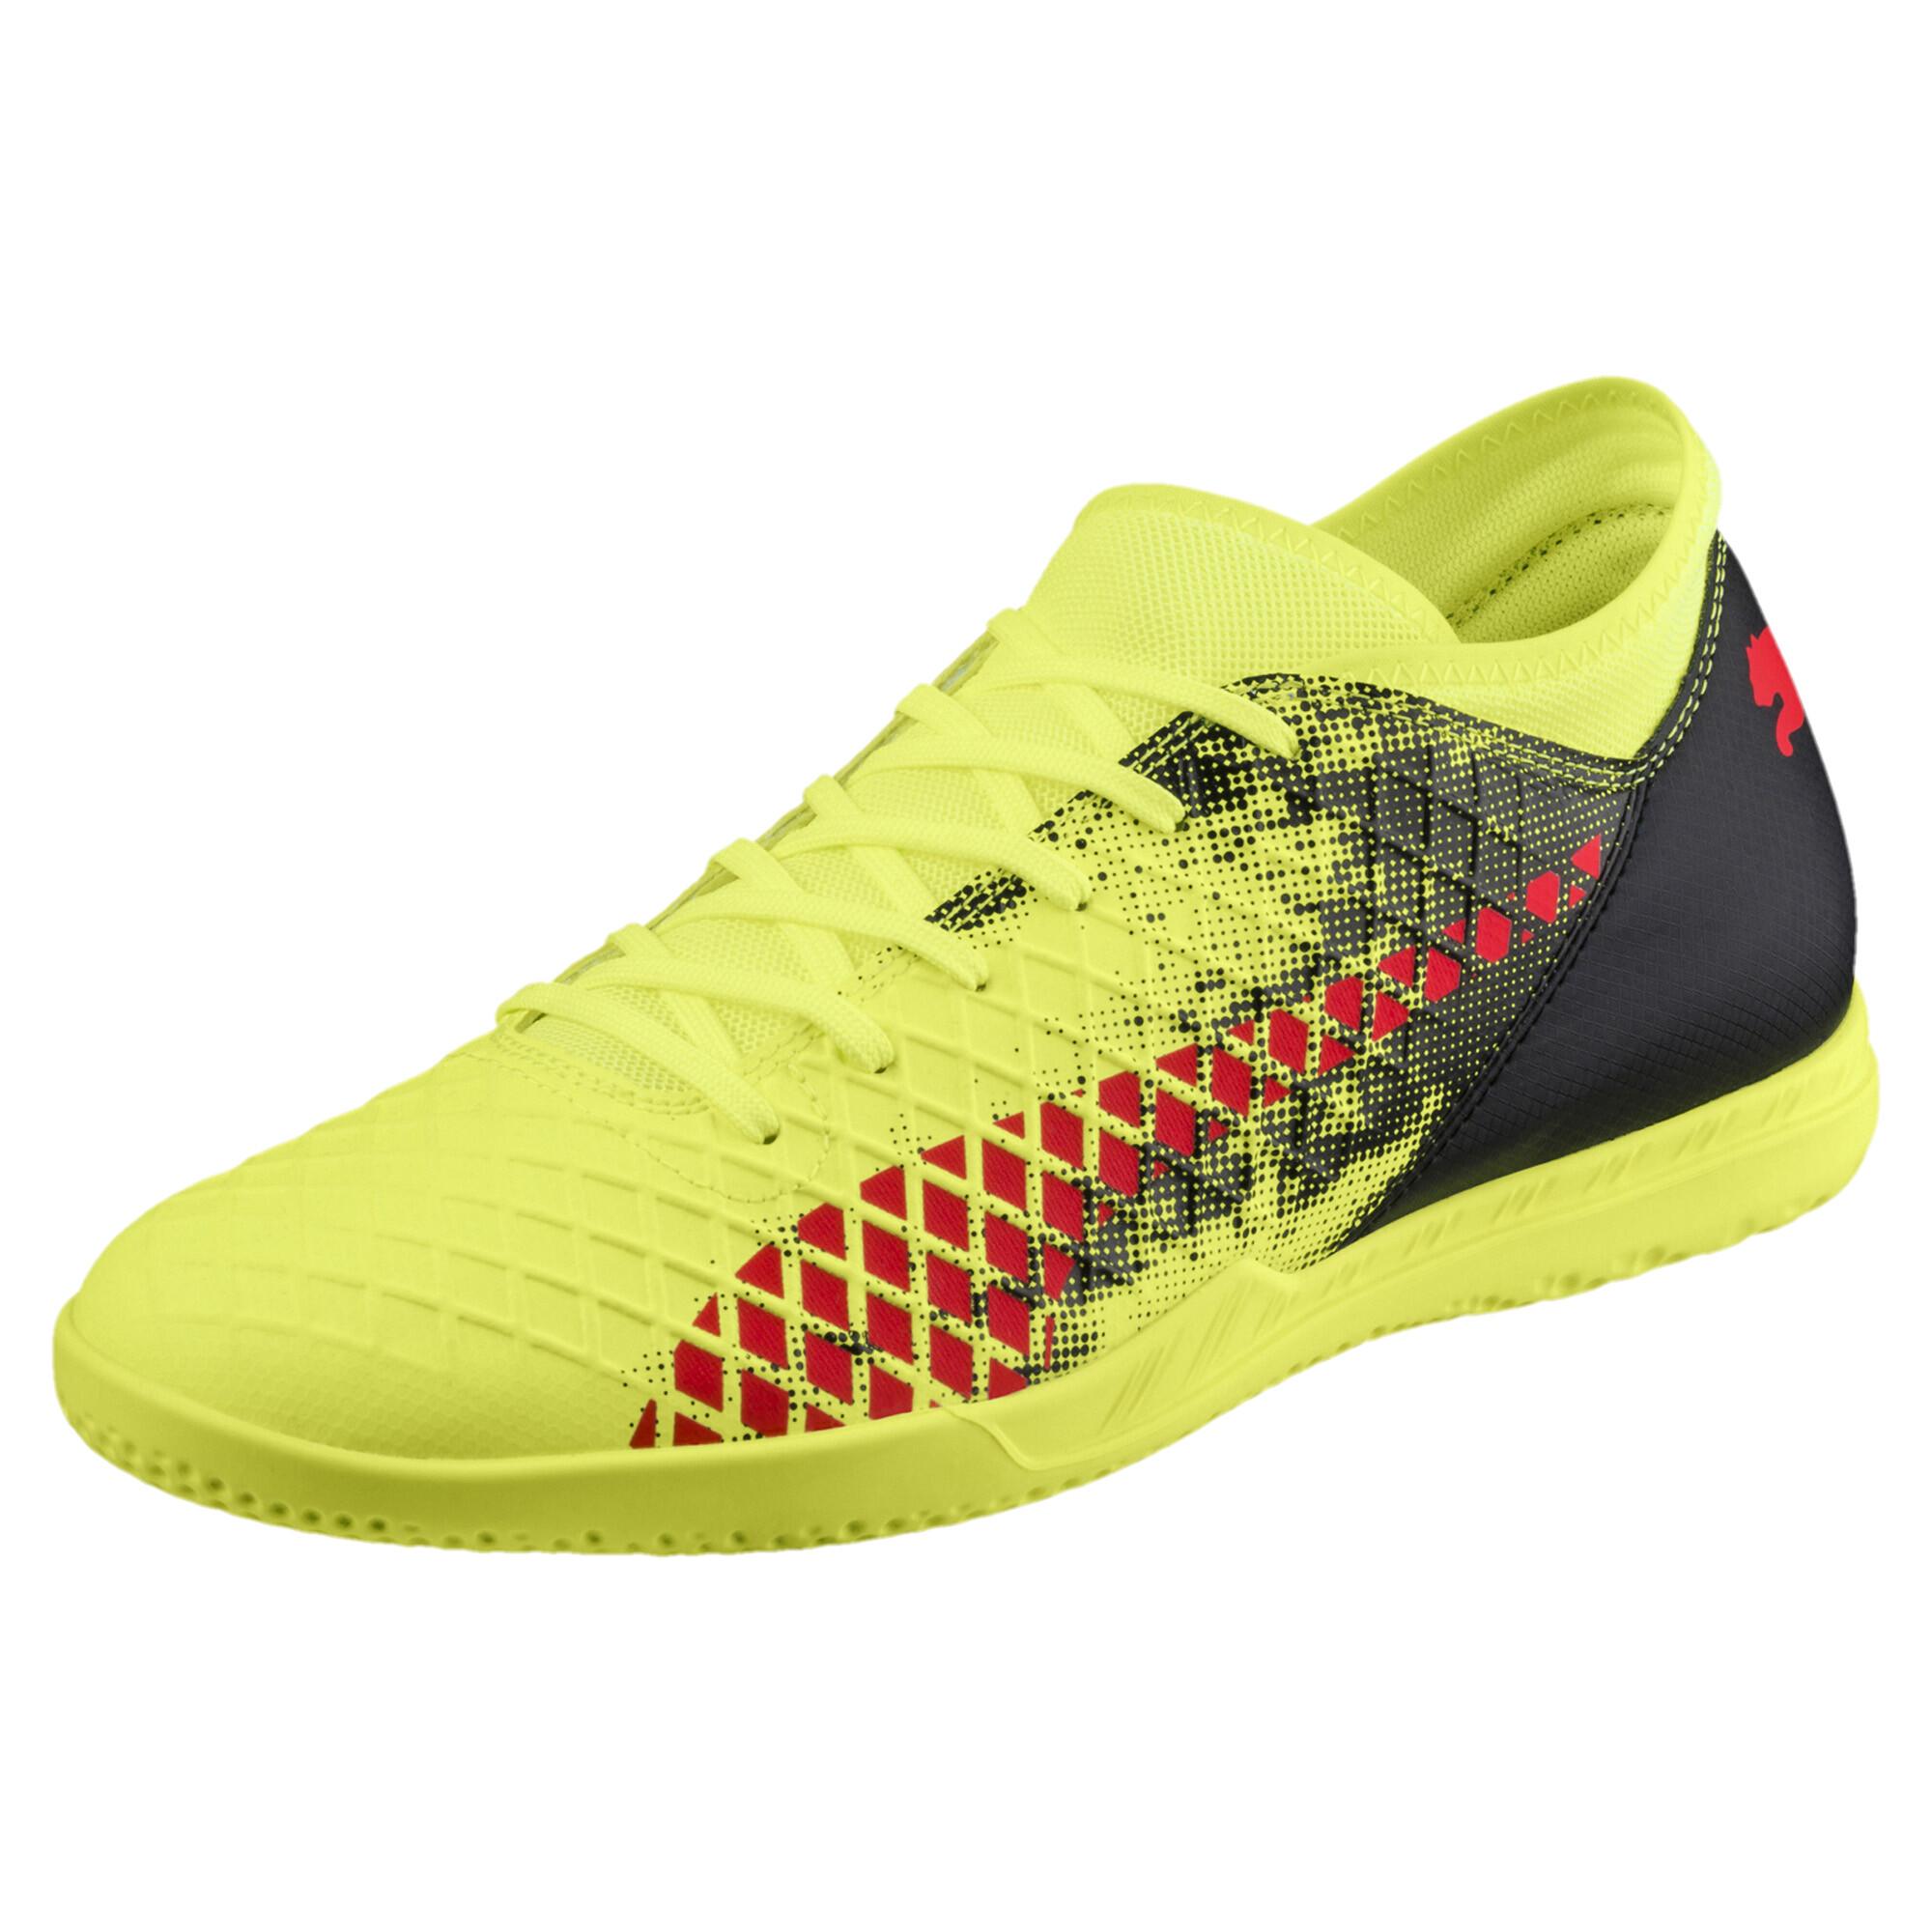 Image Puma Men's FUTURE 18.4 IT Football Boots #1